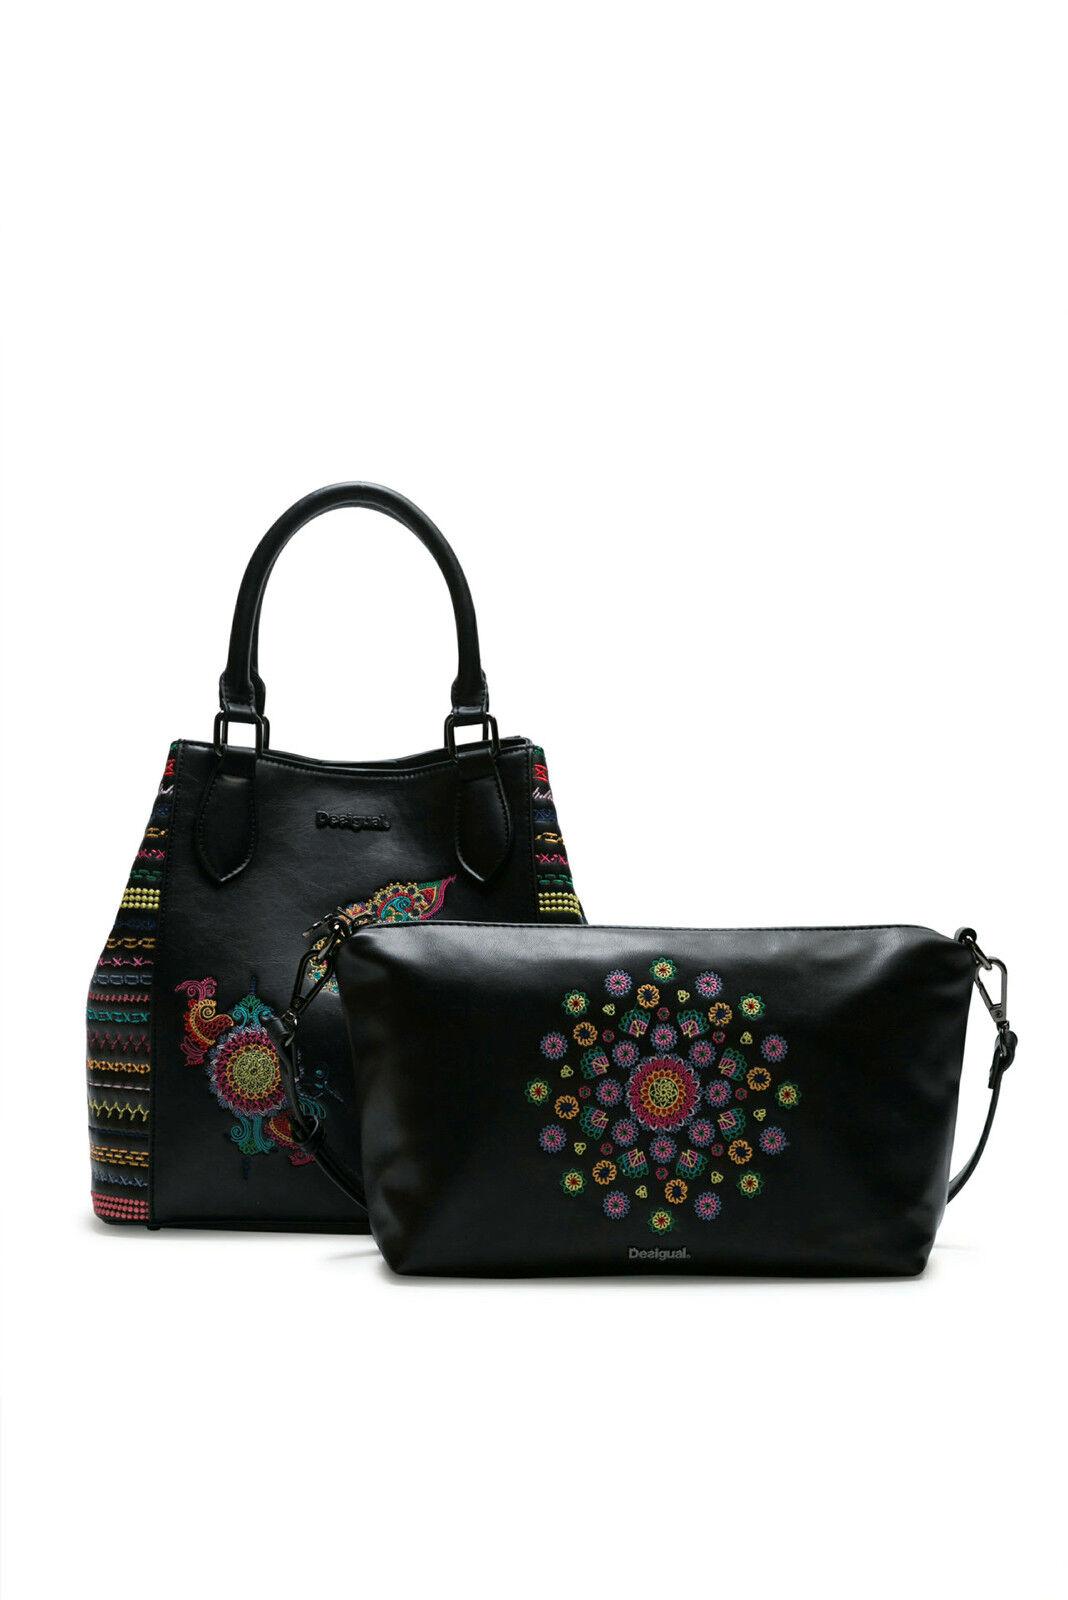 Desigual Tropic Carry Shoulder Bag Raspberry Bis